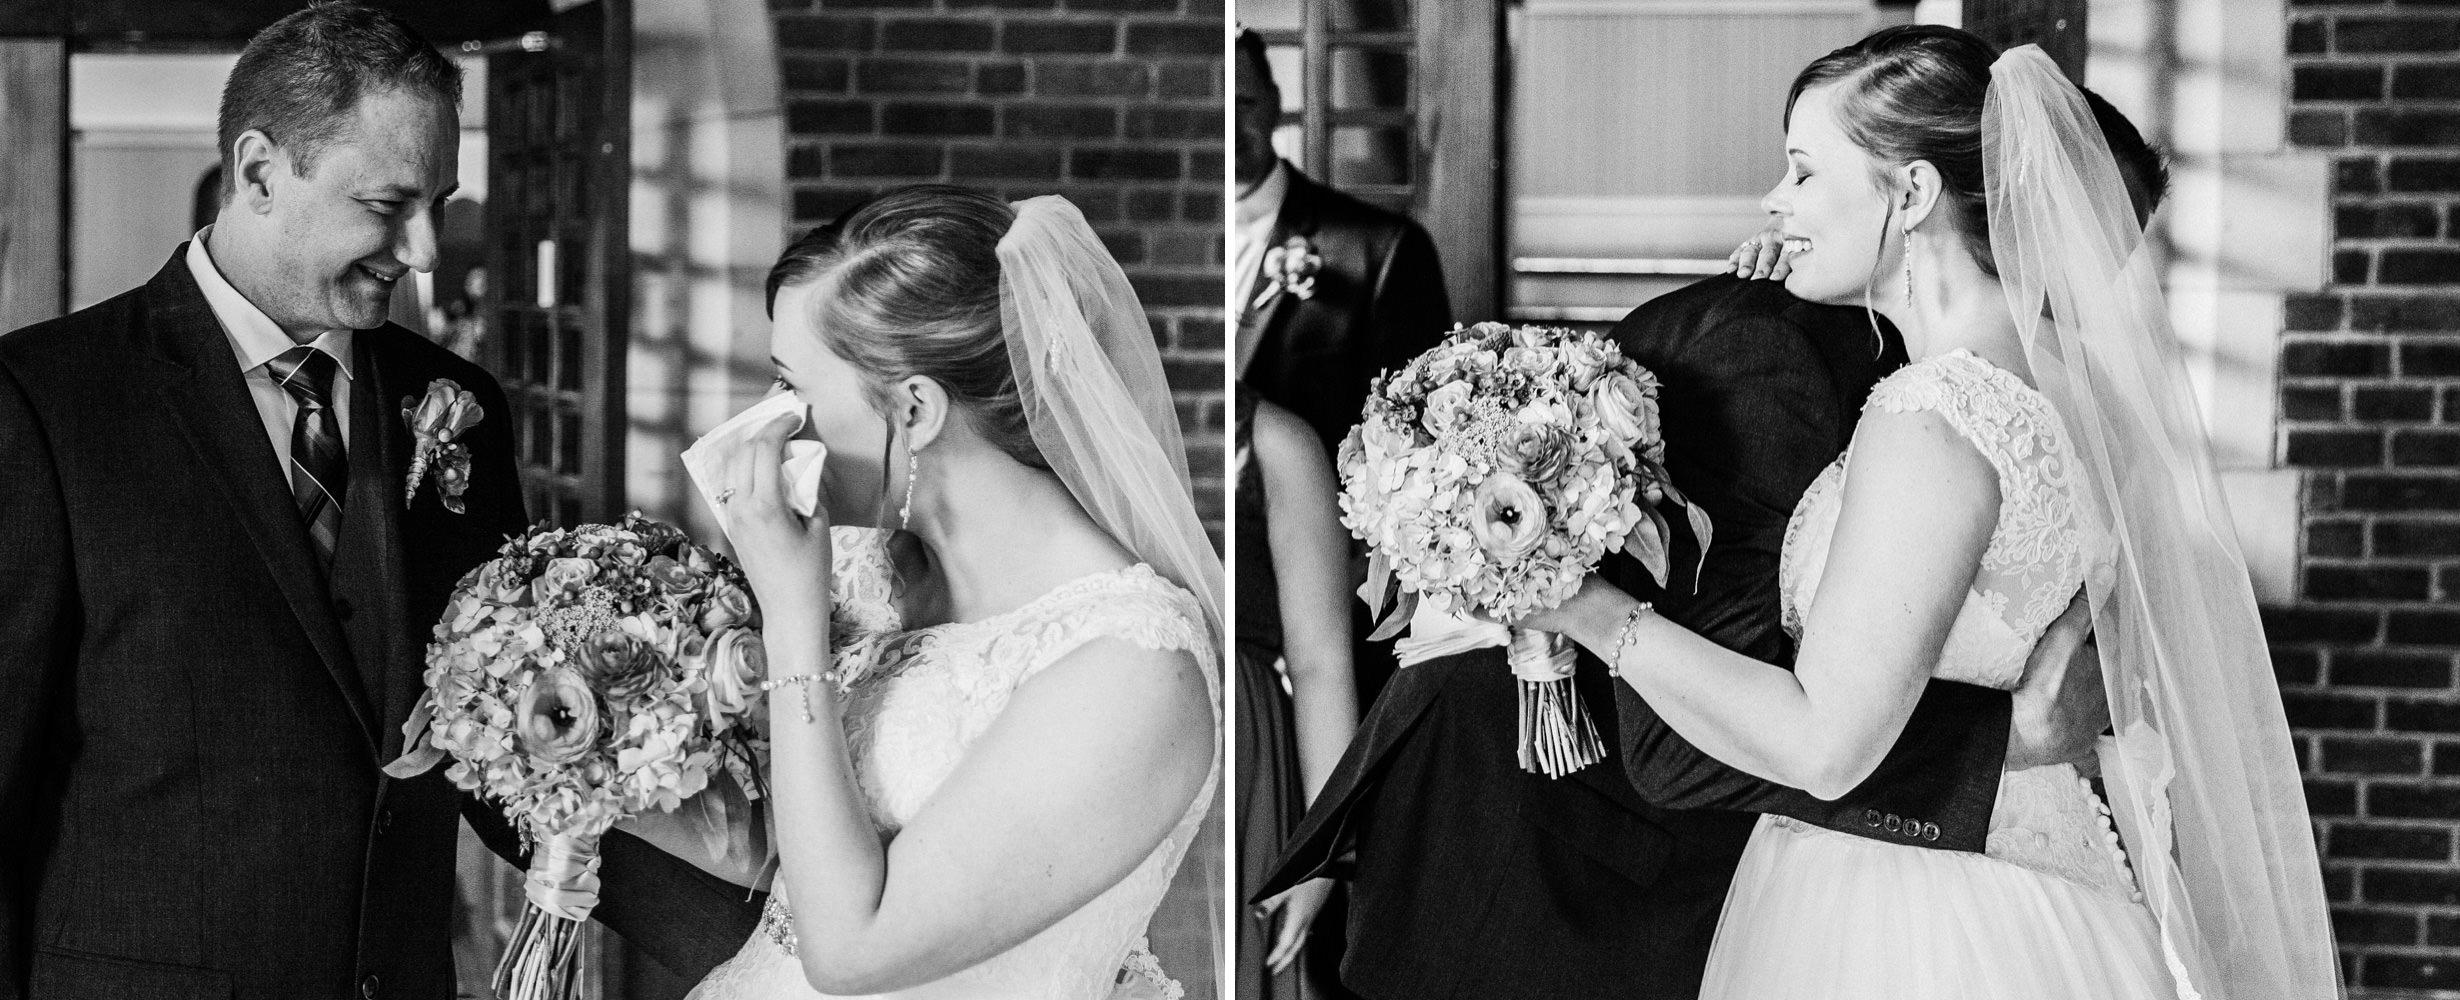 MAULDIN_WEDDING_MONTGOMERY_ALABAMA_WEDDING_PHOTOGRAPHY_68